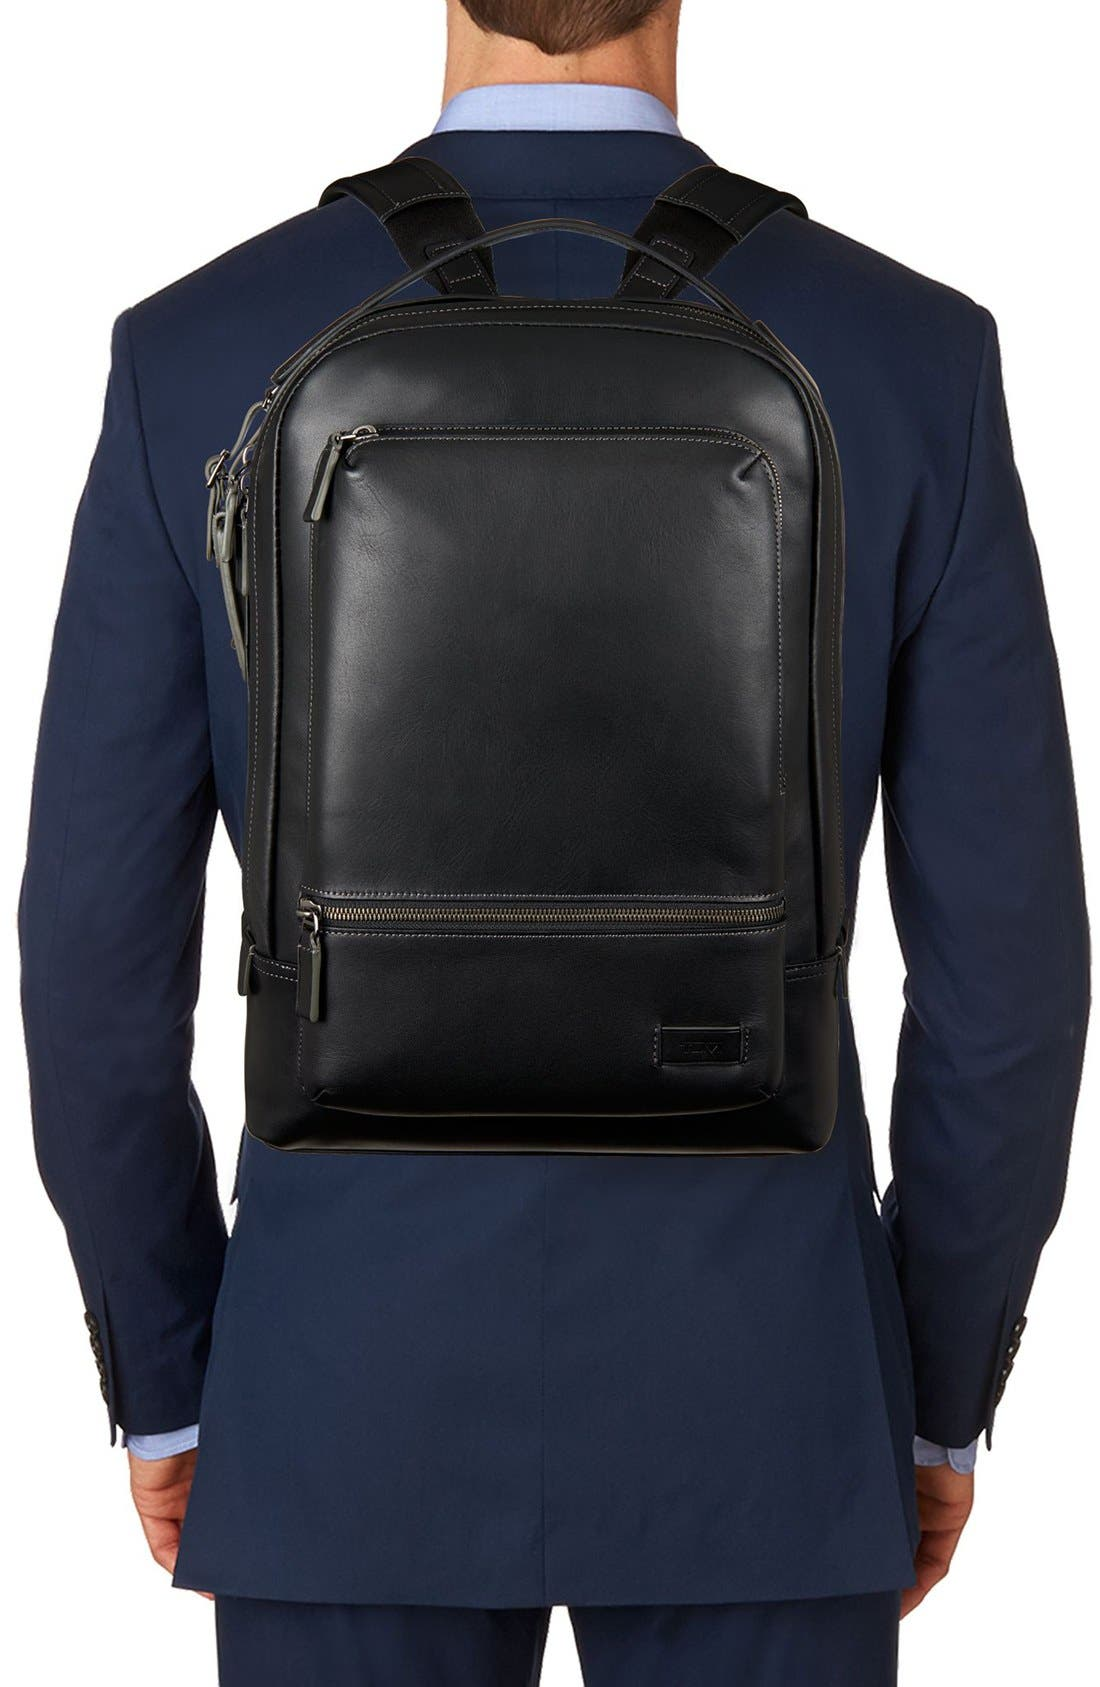 'Harrison - Bates' Leather Backpack,                             Alternate thumbnail 2, color,                             Black